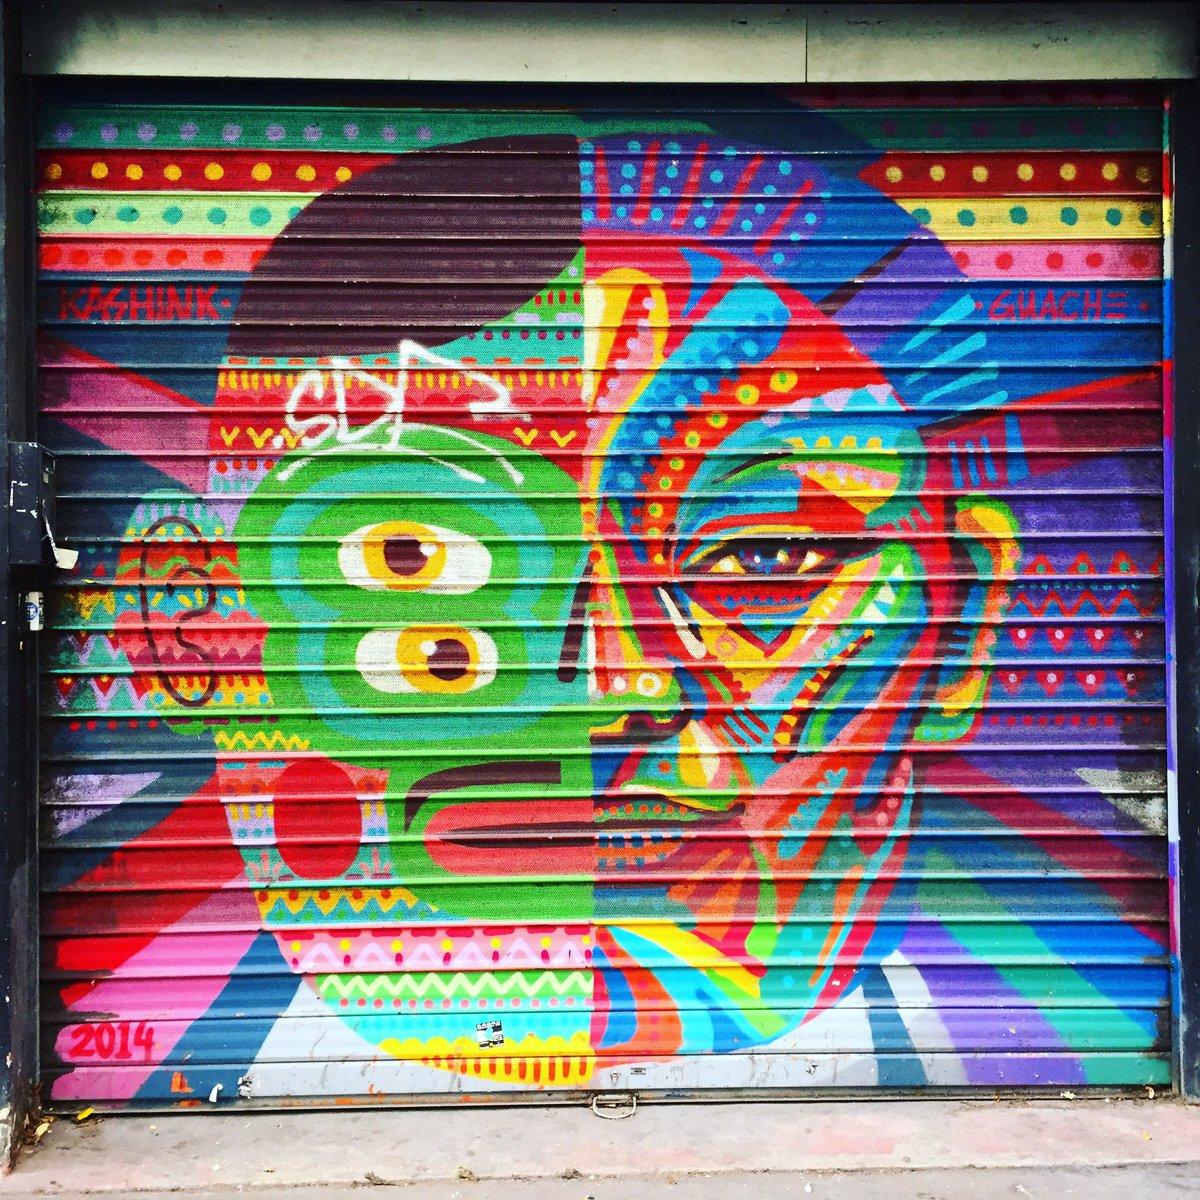 Collab between #kashink &amp; #guache #guacheart  #streetart #graffiti #graff #spray #bombing #wall #urbanart #graffitiwall #graffart<br>http://pic.twitter.com/0EcKFFcXf9